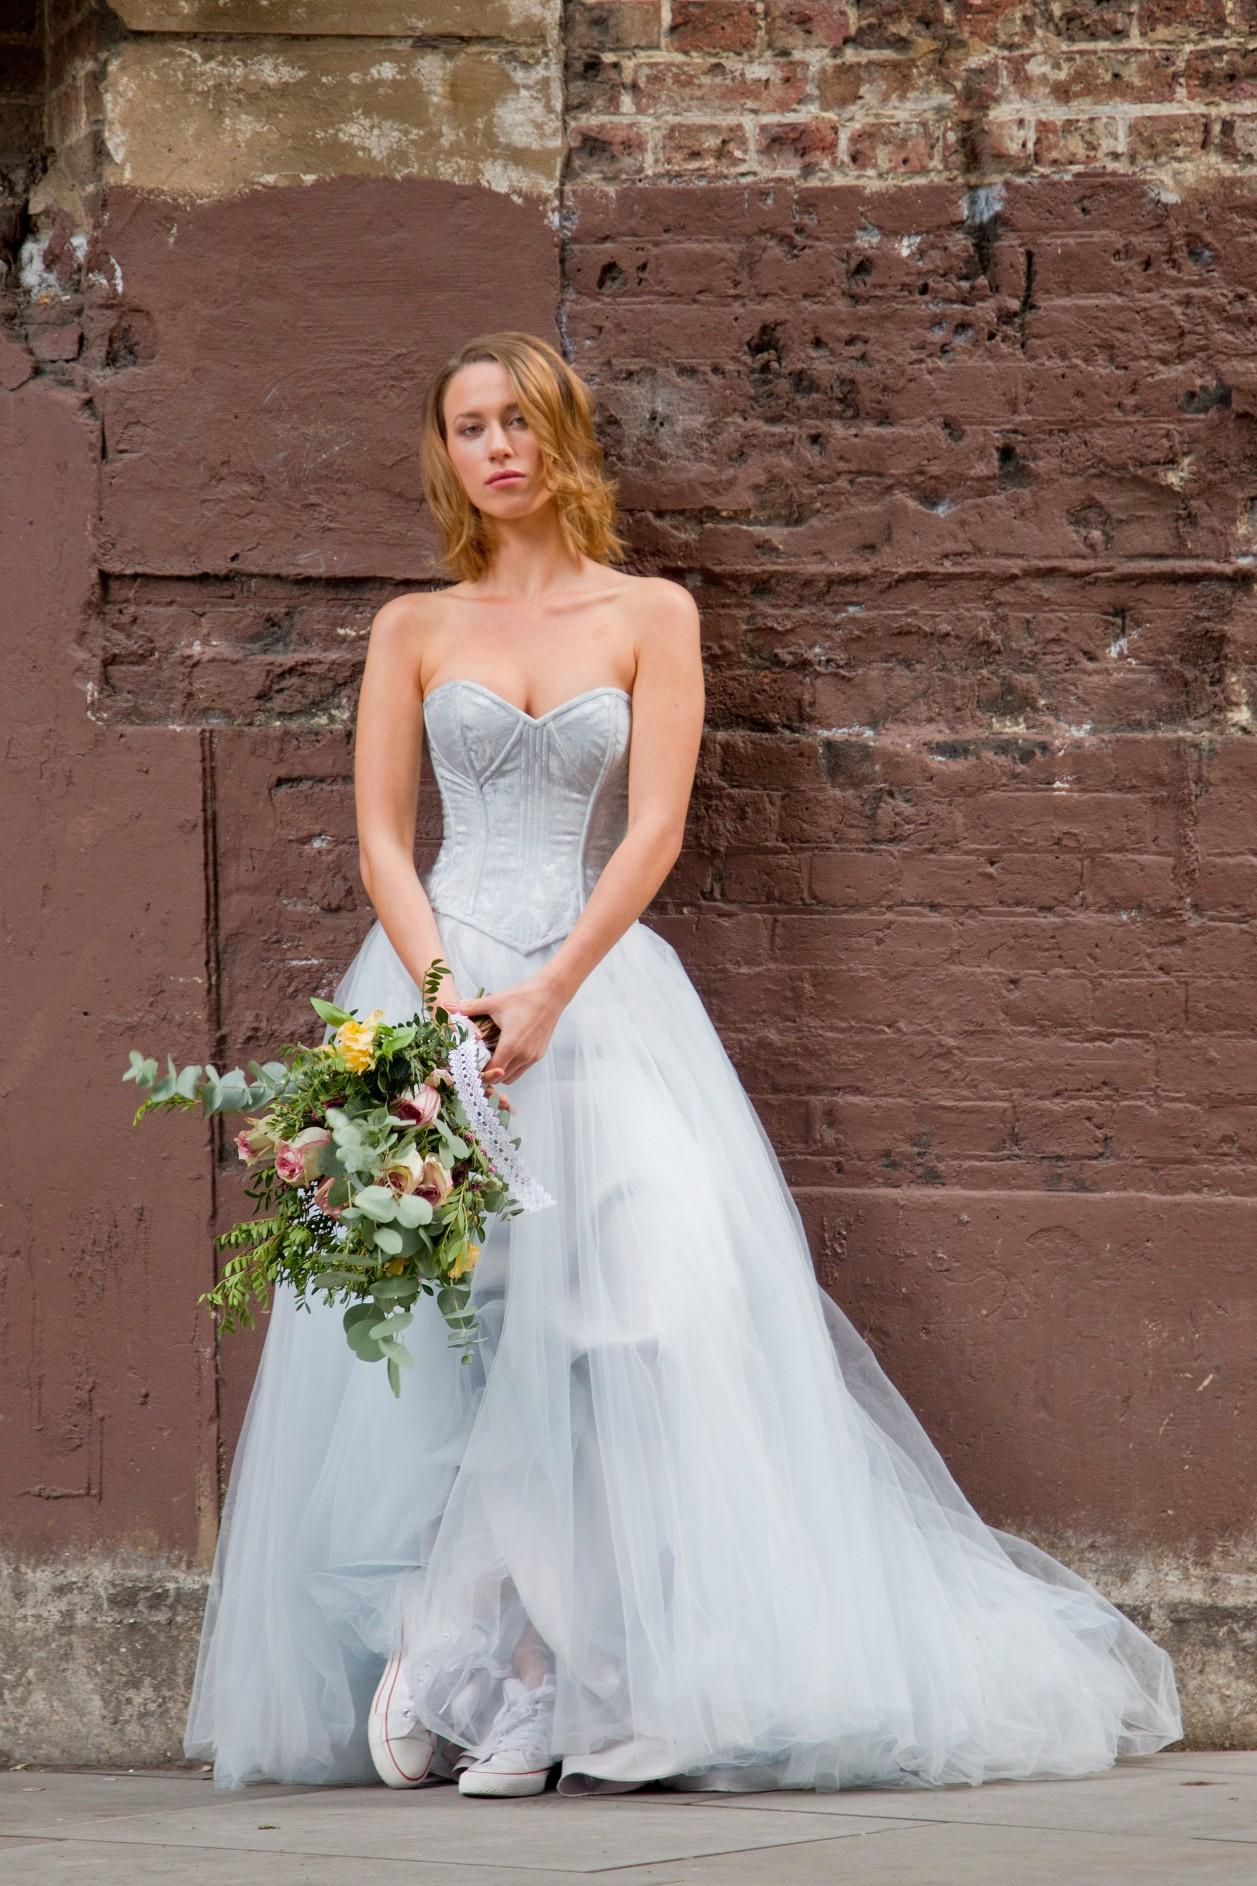 Fiona Elizabeth Couture - Foran Sauvage Concept - alternative wedding dress - unique bridalwear 1 (2)